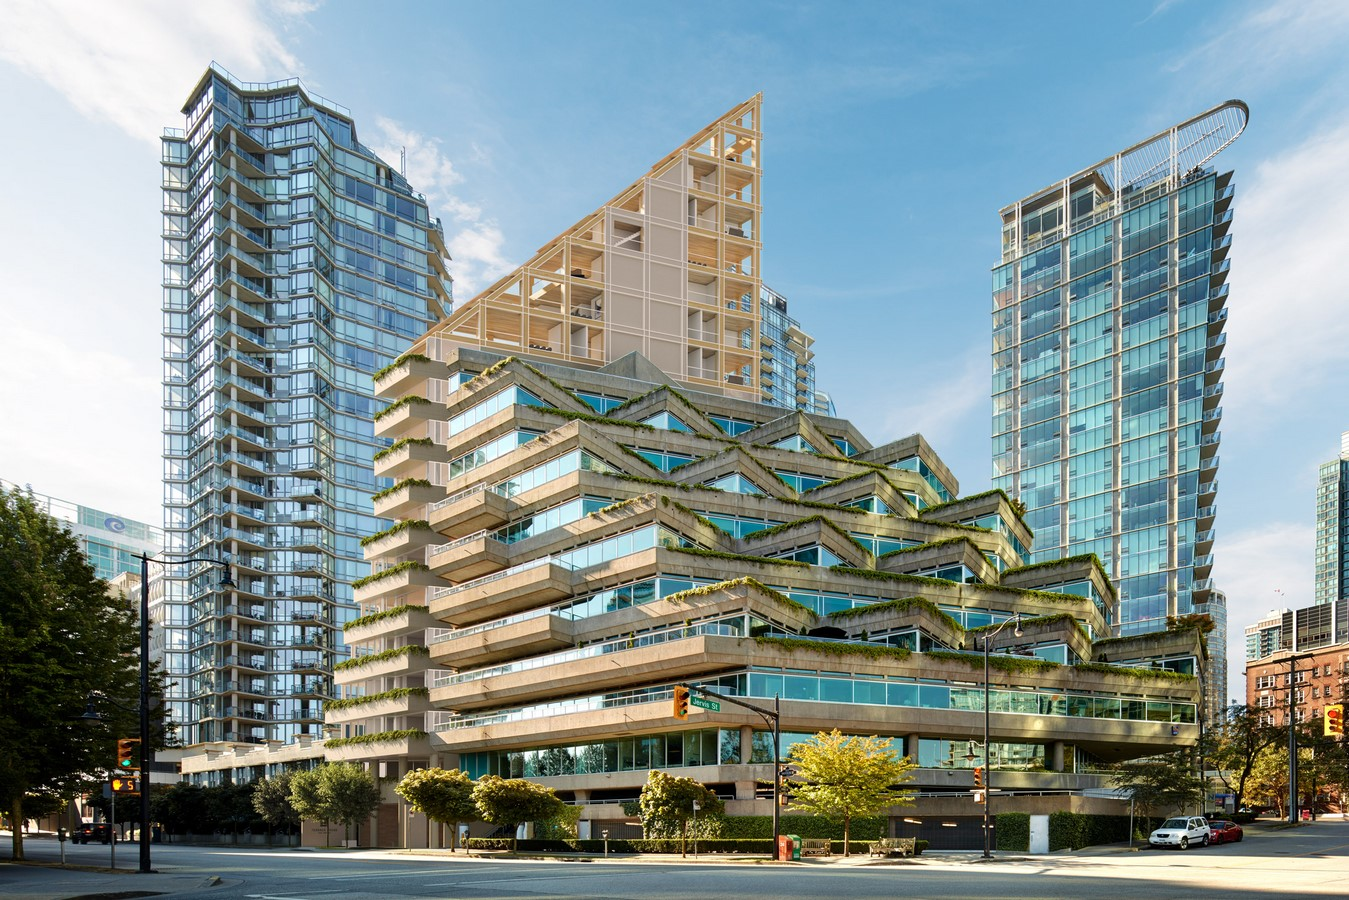 Terrace House by Shigeru Ban: The Tallest Hybrid Wood Tower - Sheet3